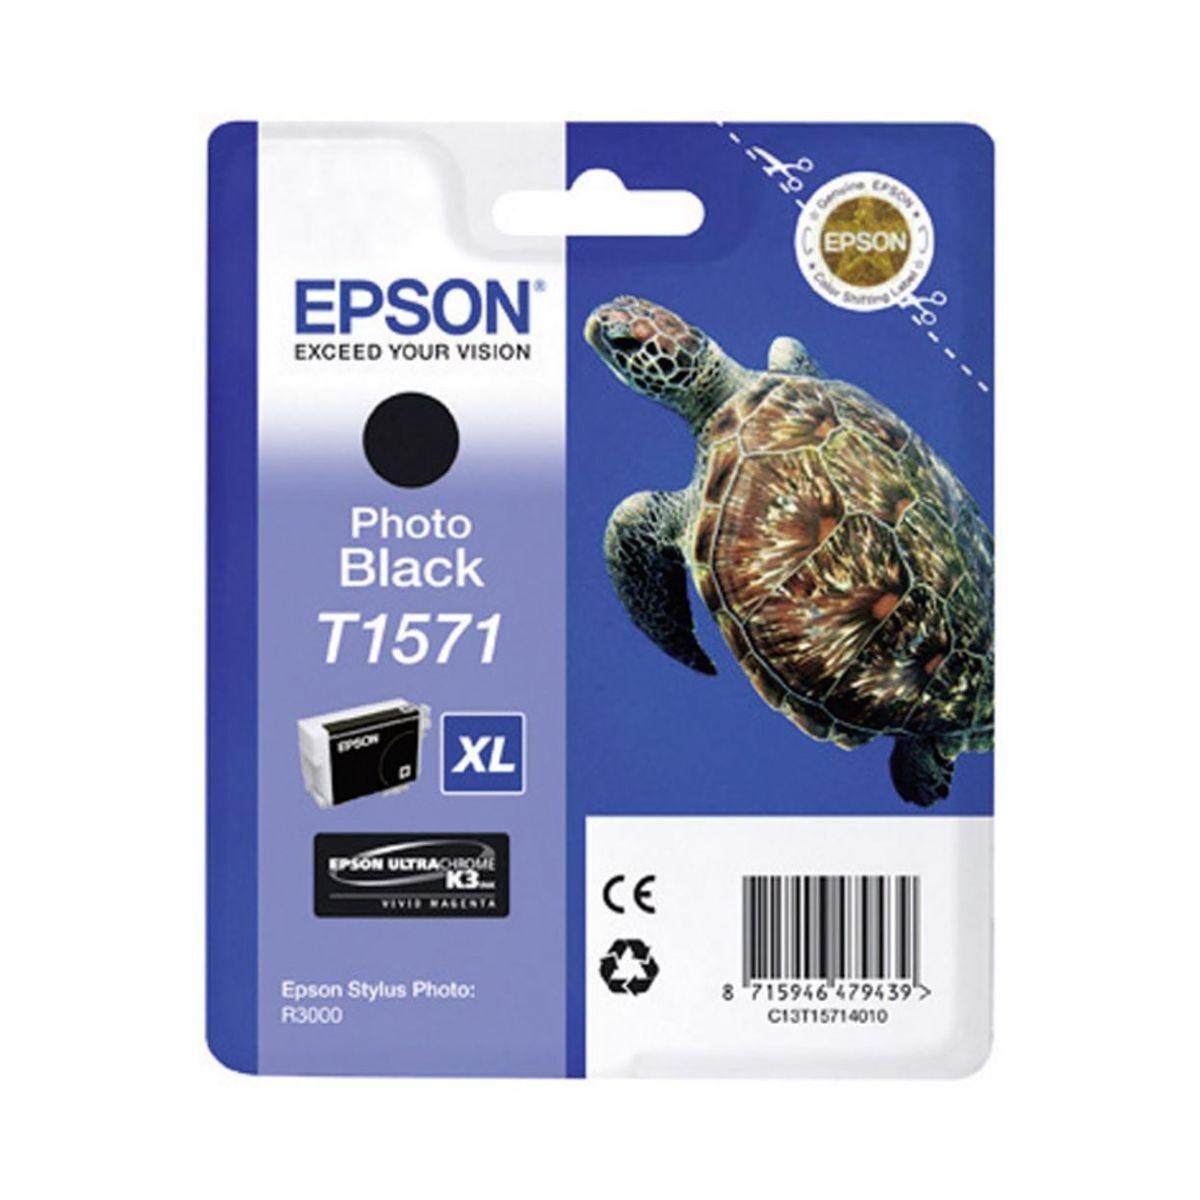 Epson R3000 Photo Black